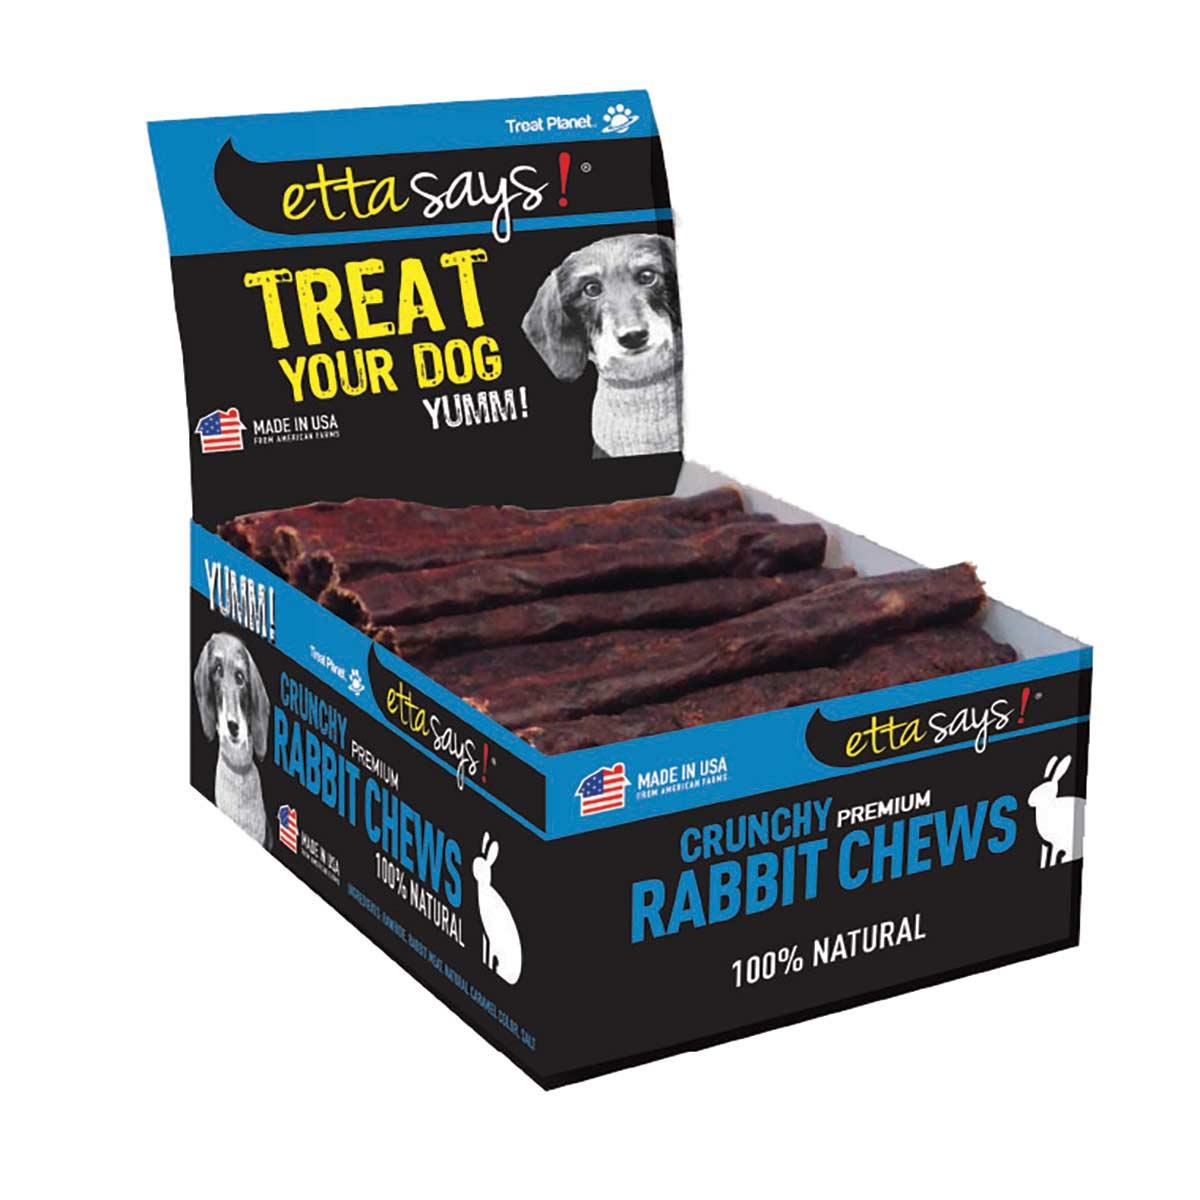 Display Box with Etta Says! Crunchy Rabbit Chews 36 Count